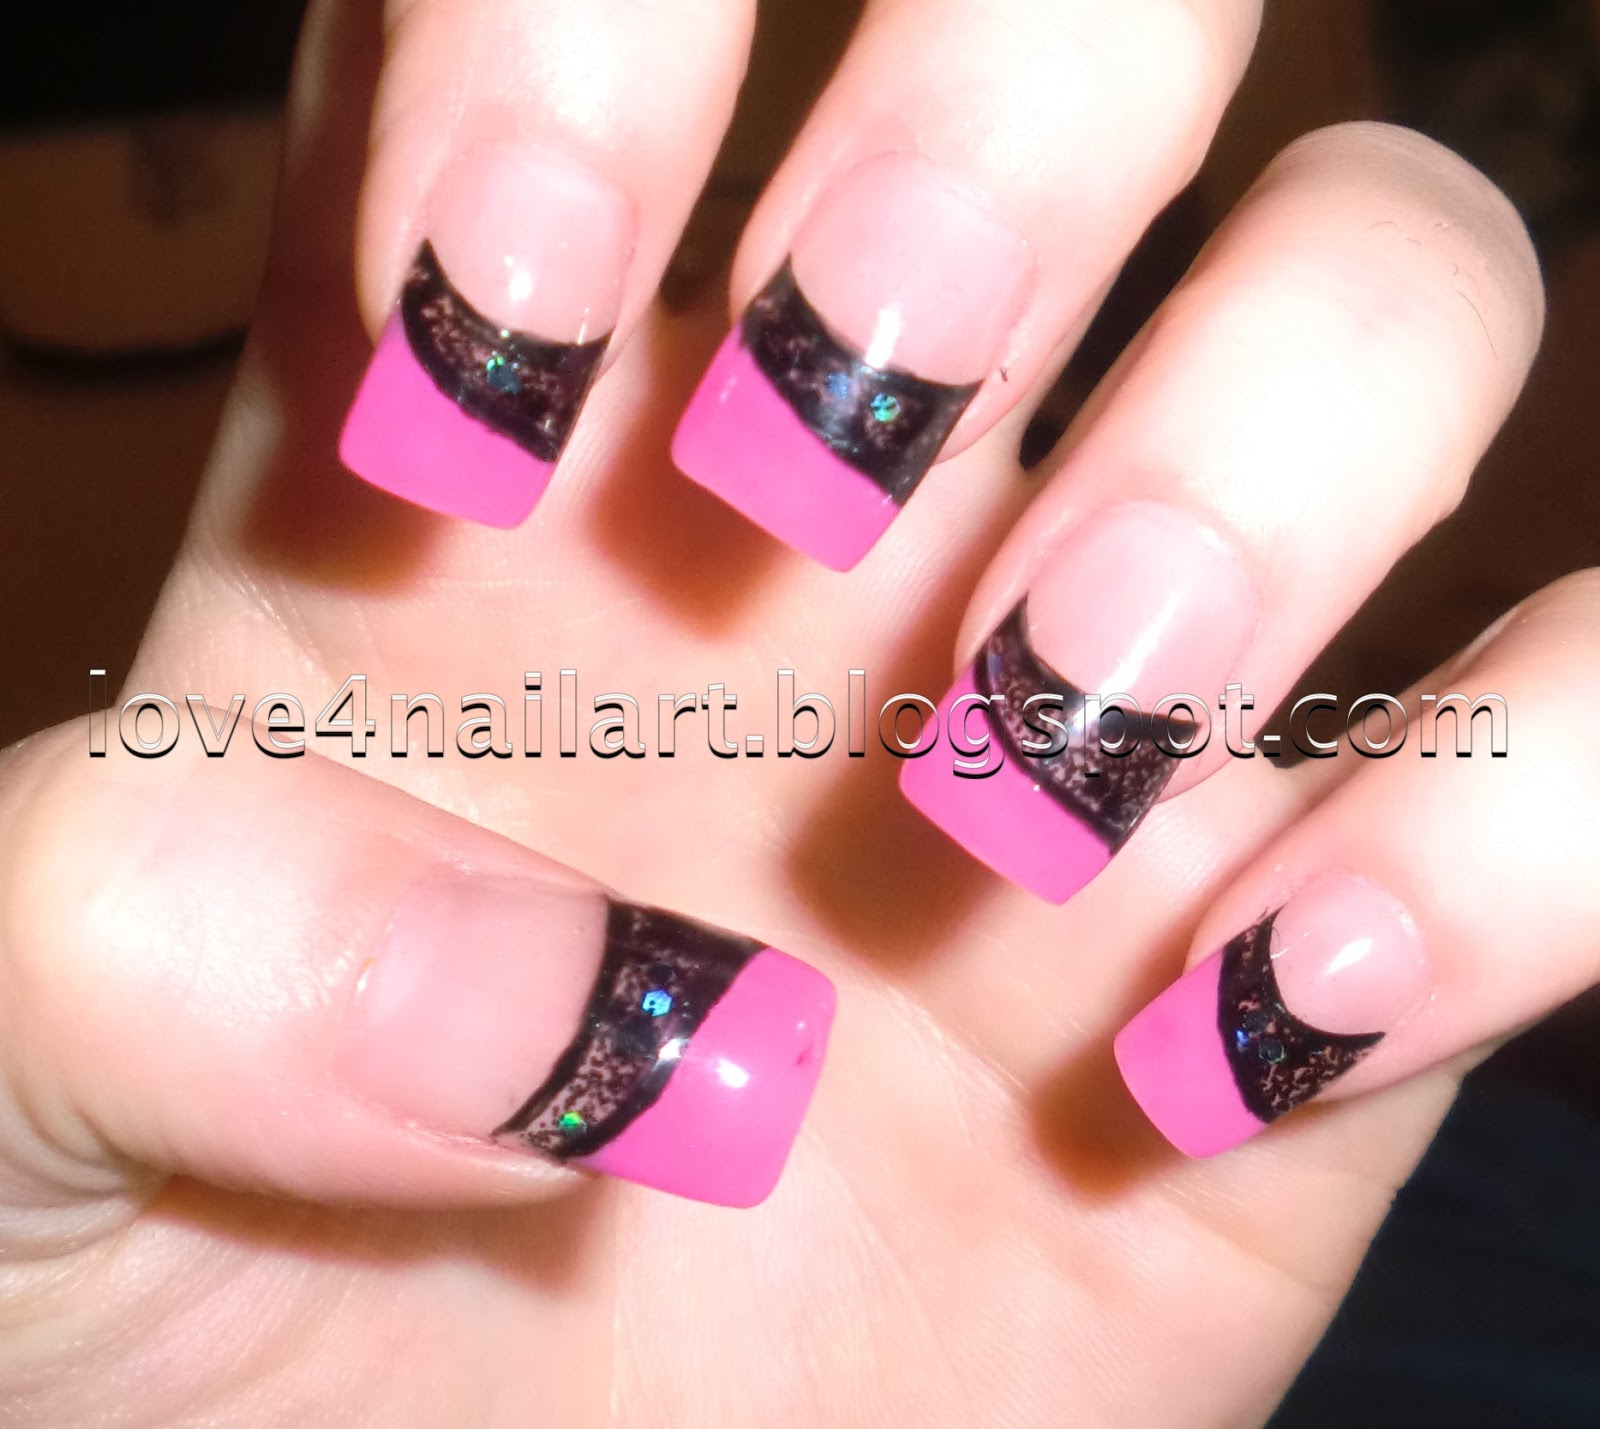 Love4NailArt: Pink & Black Encapsulated Colored Acrylic Nails